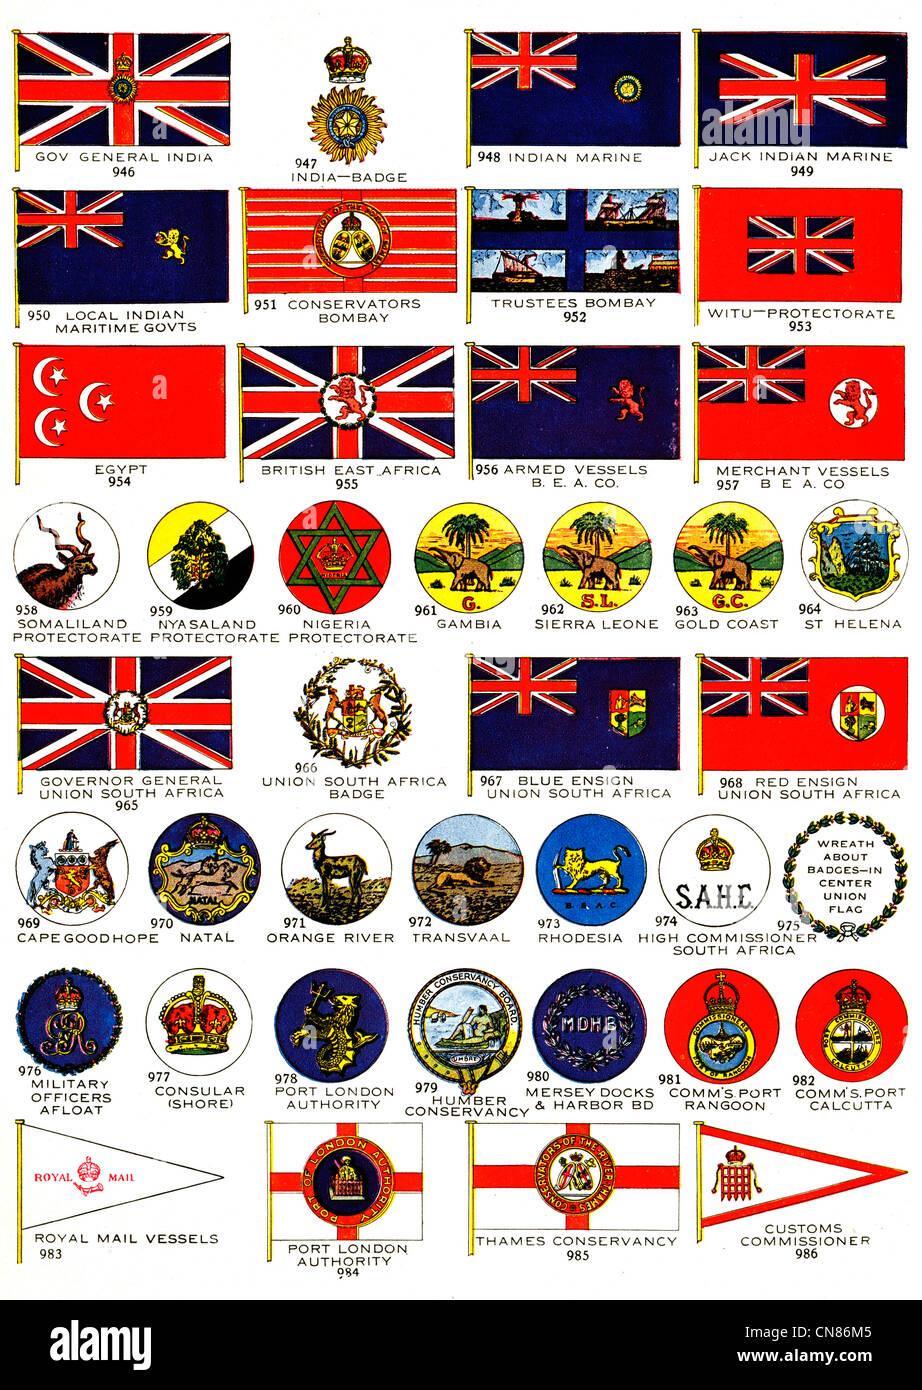 First published 1917 flags flag india badge marine conservators first published 1917 flags flag india badge marine conservators egypt british east africa witu armed vessel nigeria niyasaland biocorpaavc